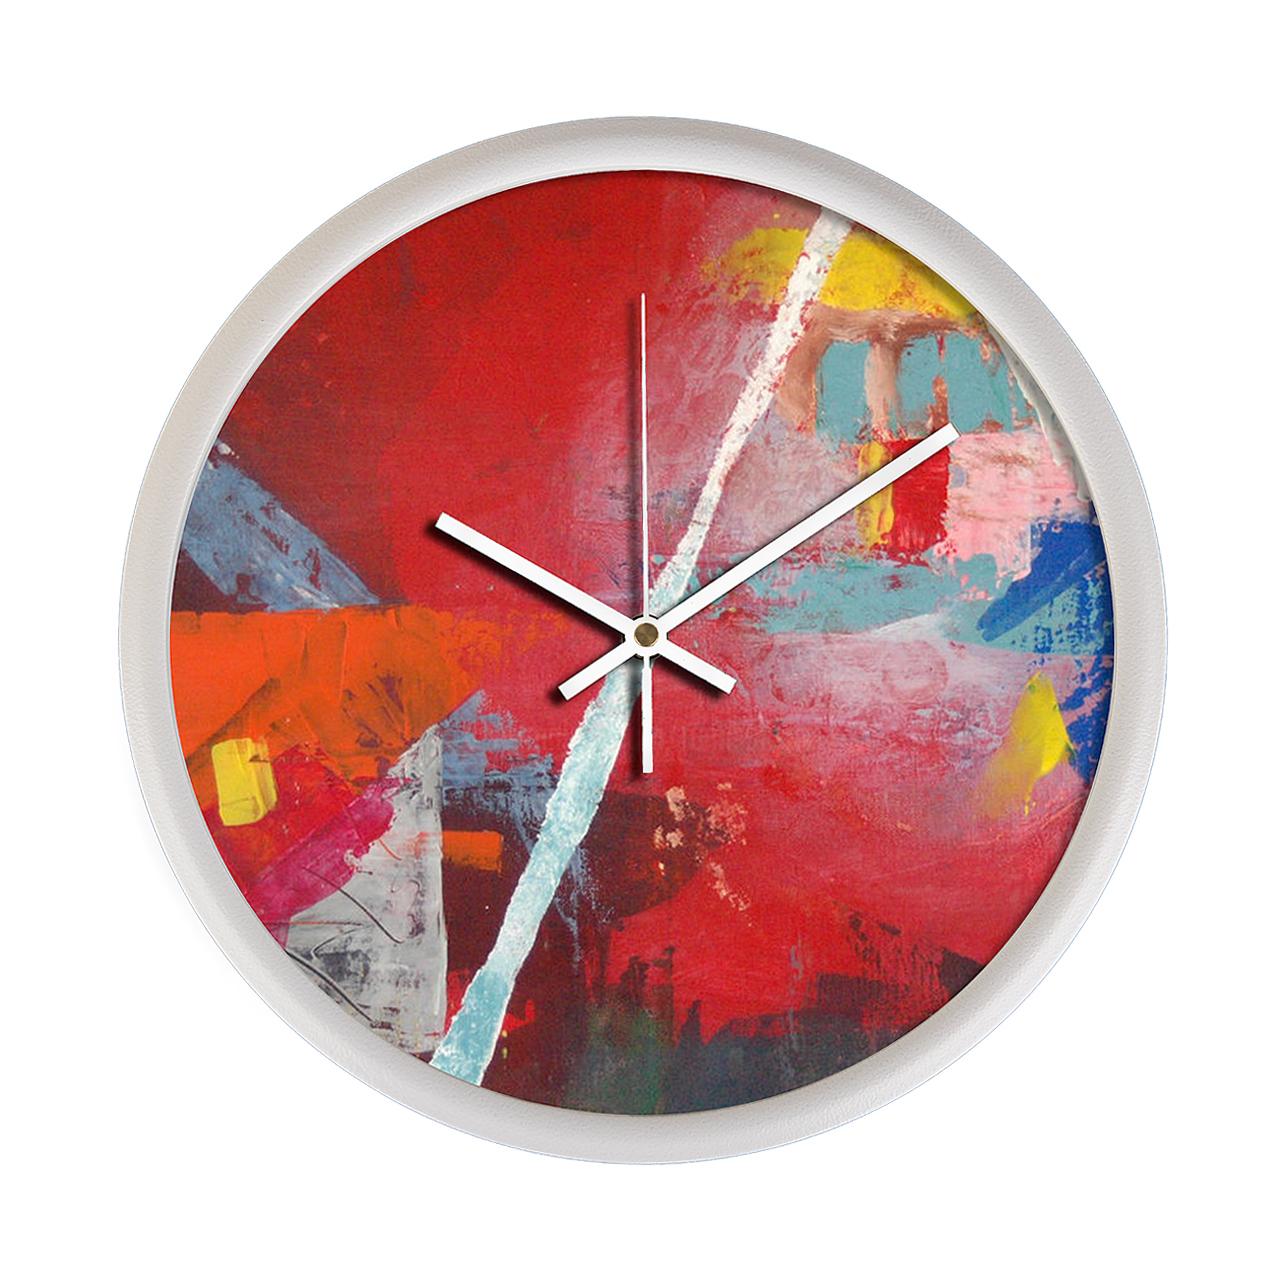 ساعت دیواری مینی مال لاکچری مدل 35Dio3_0494